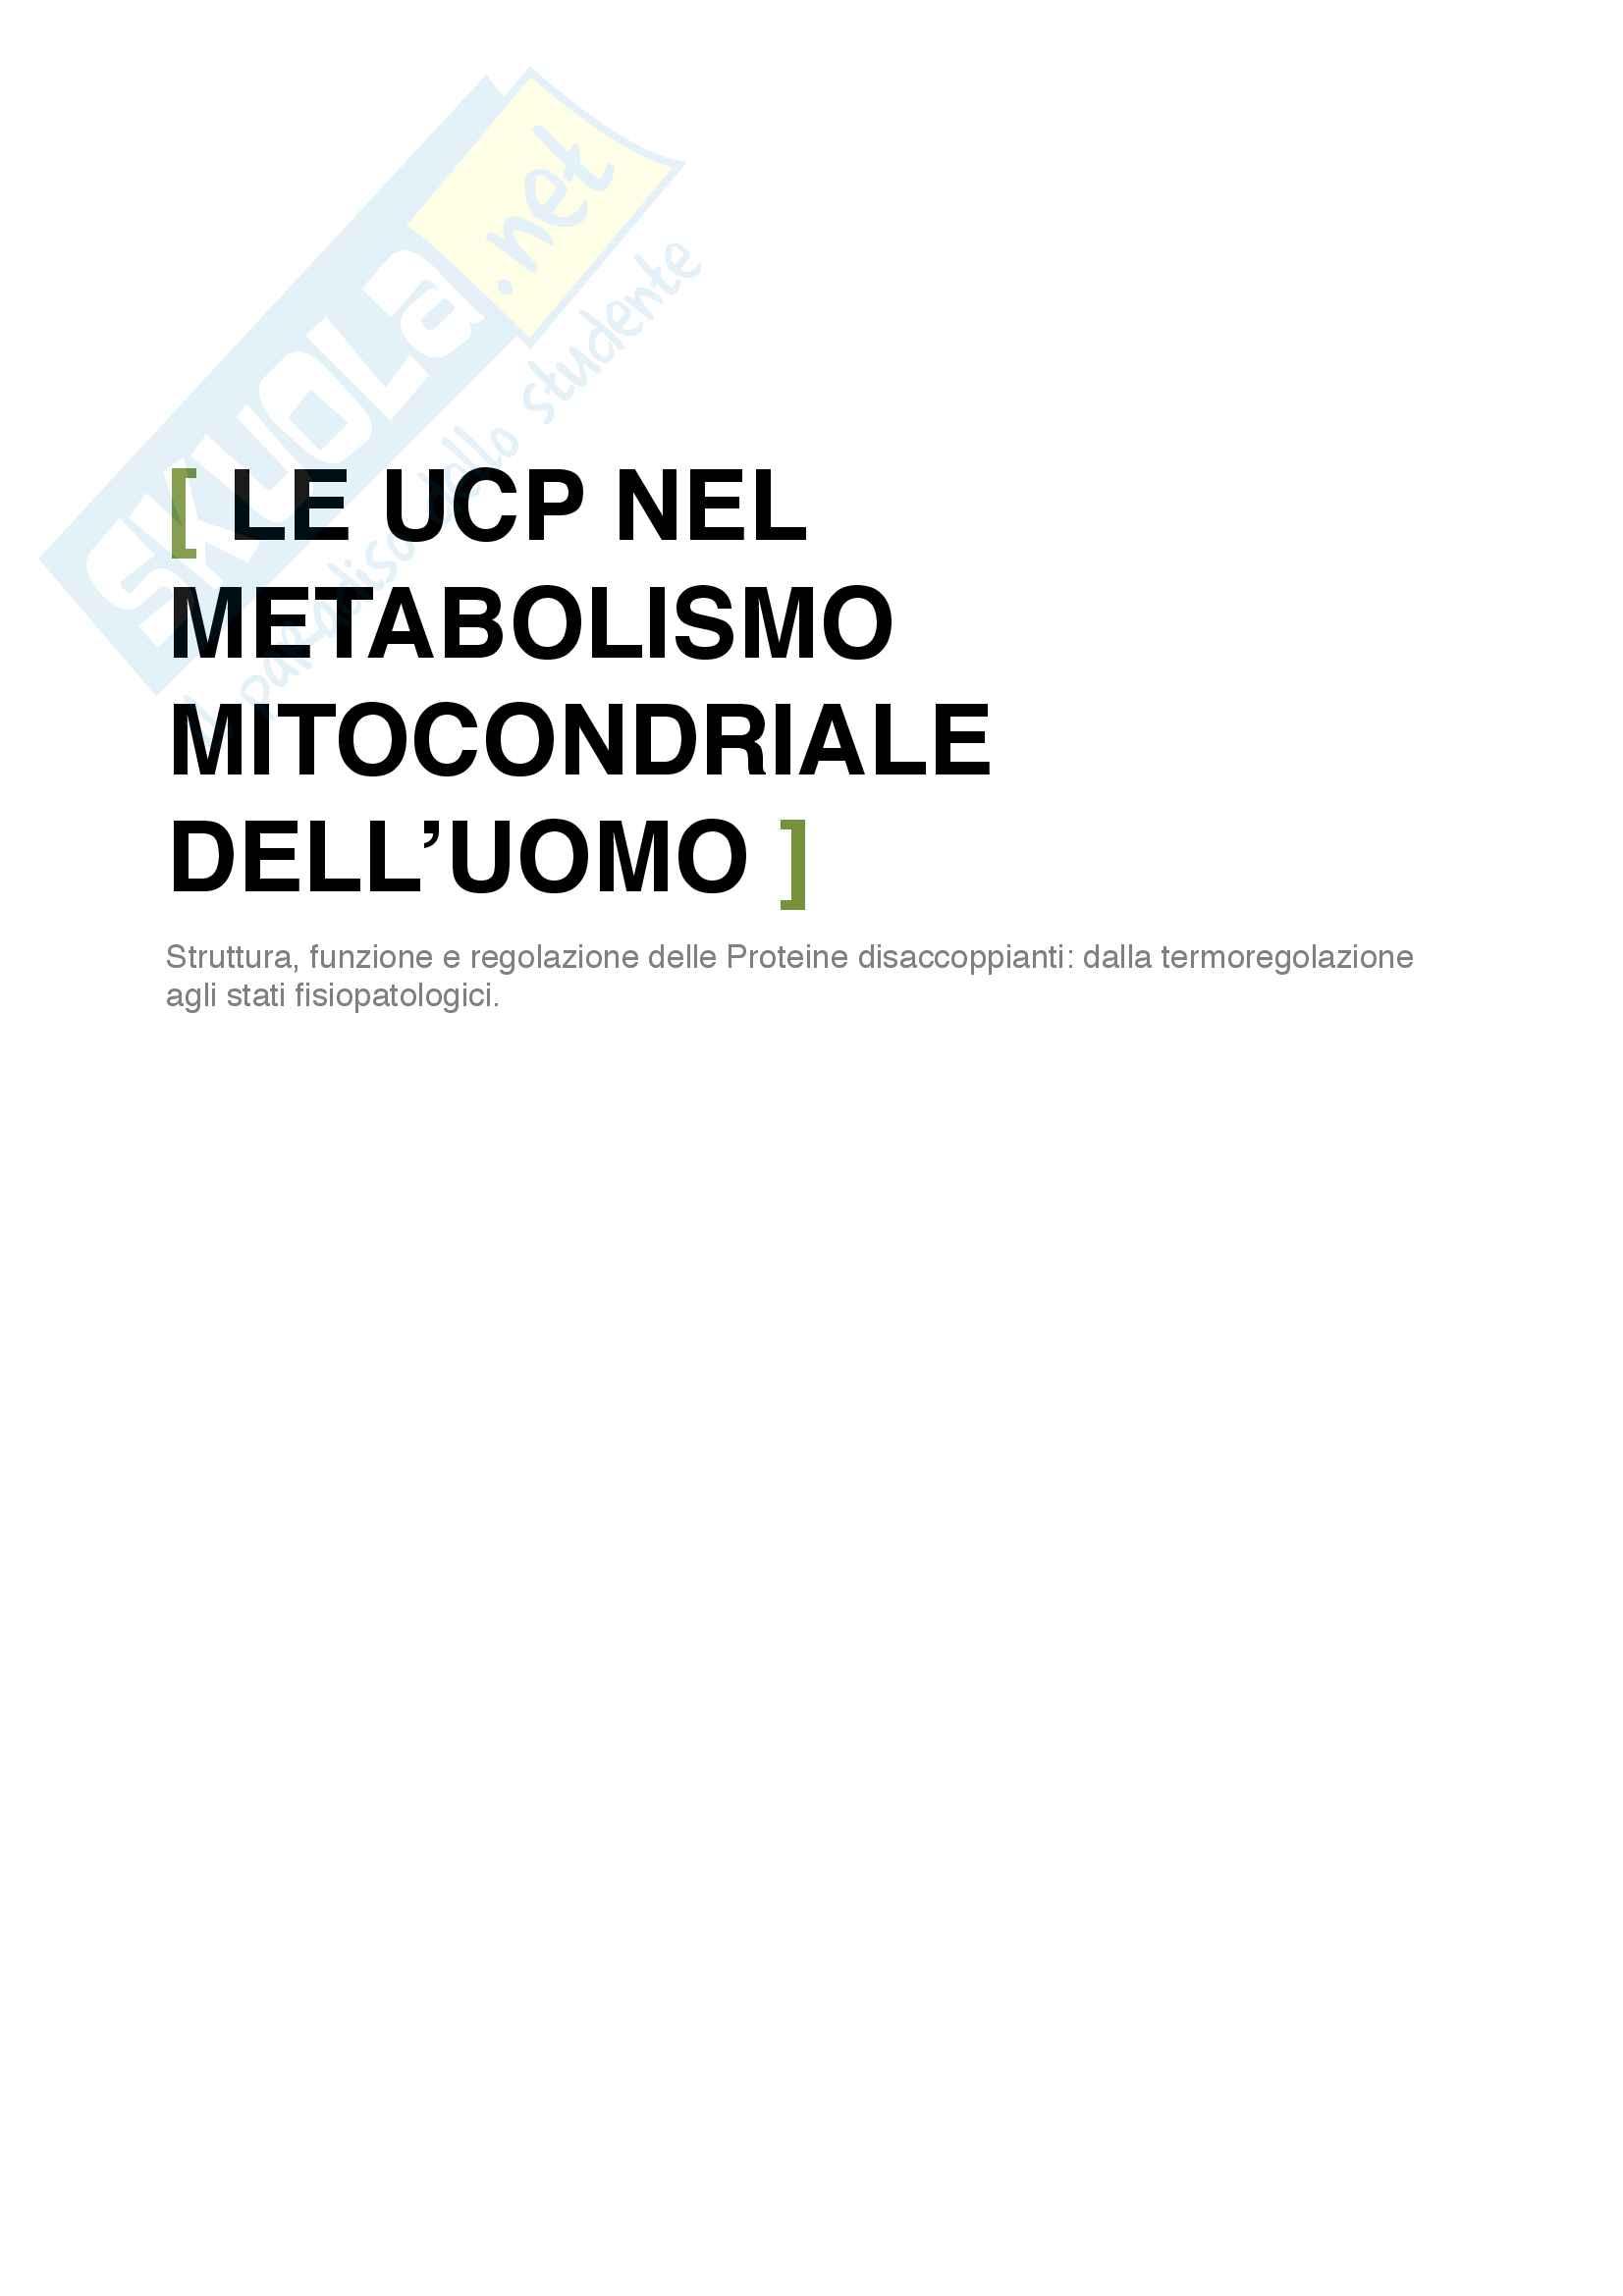 Tesina UCP: Proteine disaccoppianti mitocondriali